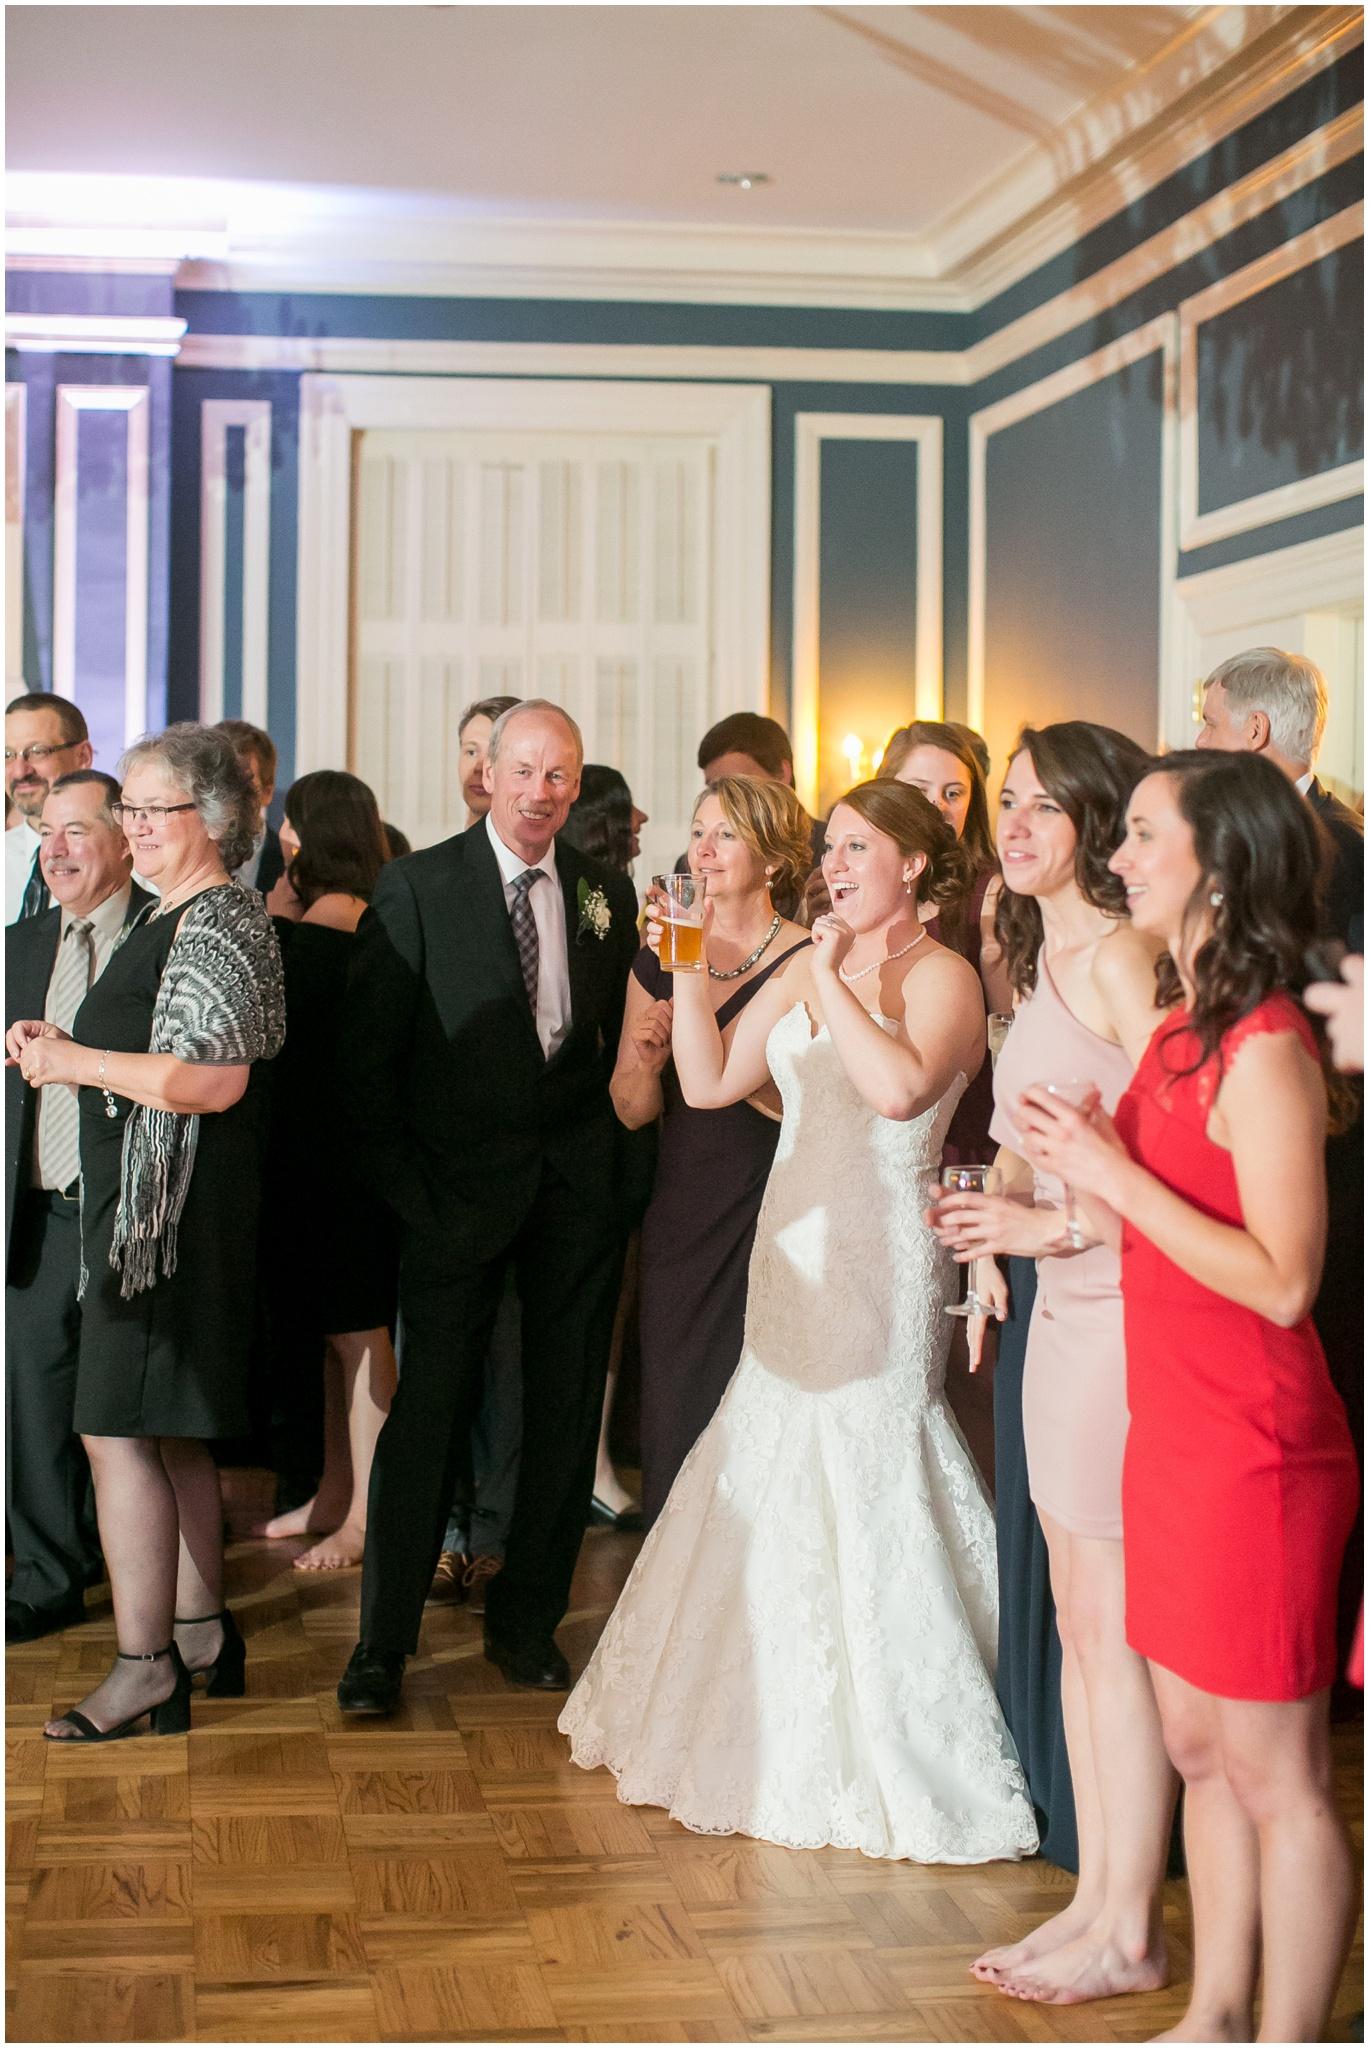 Madison_Club_Madison_Wisconsin_Wedding_Photographer_Spring_Rainy_Wedding_2676.jpg